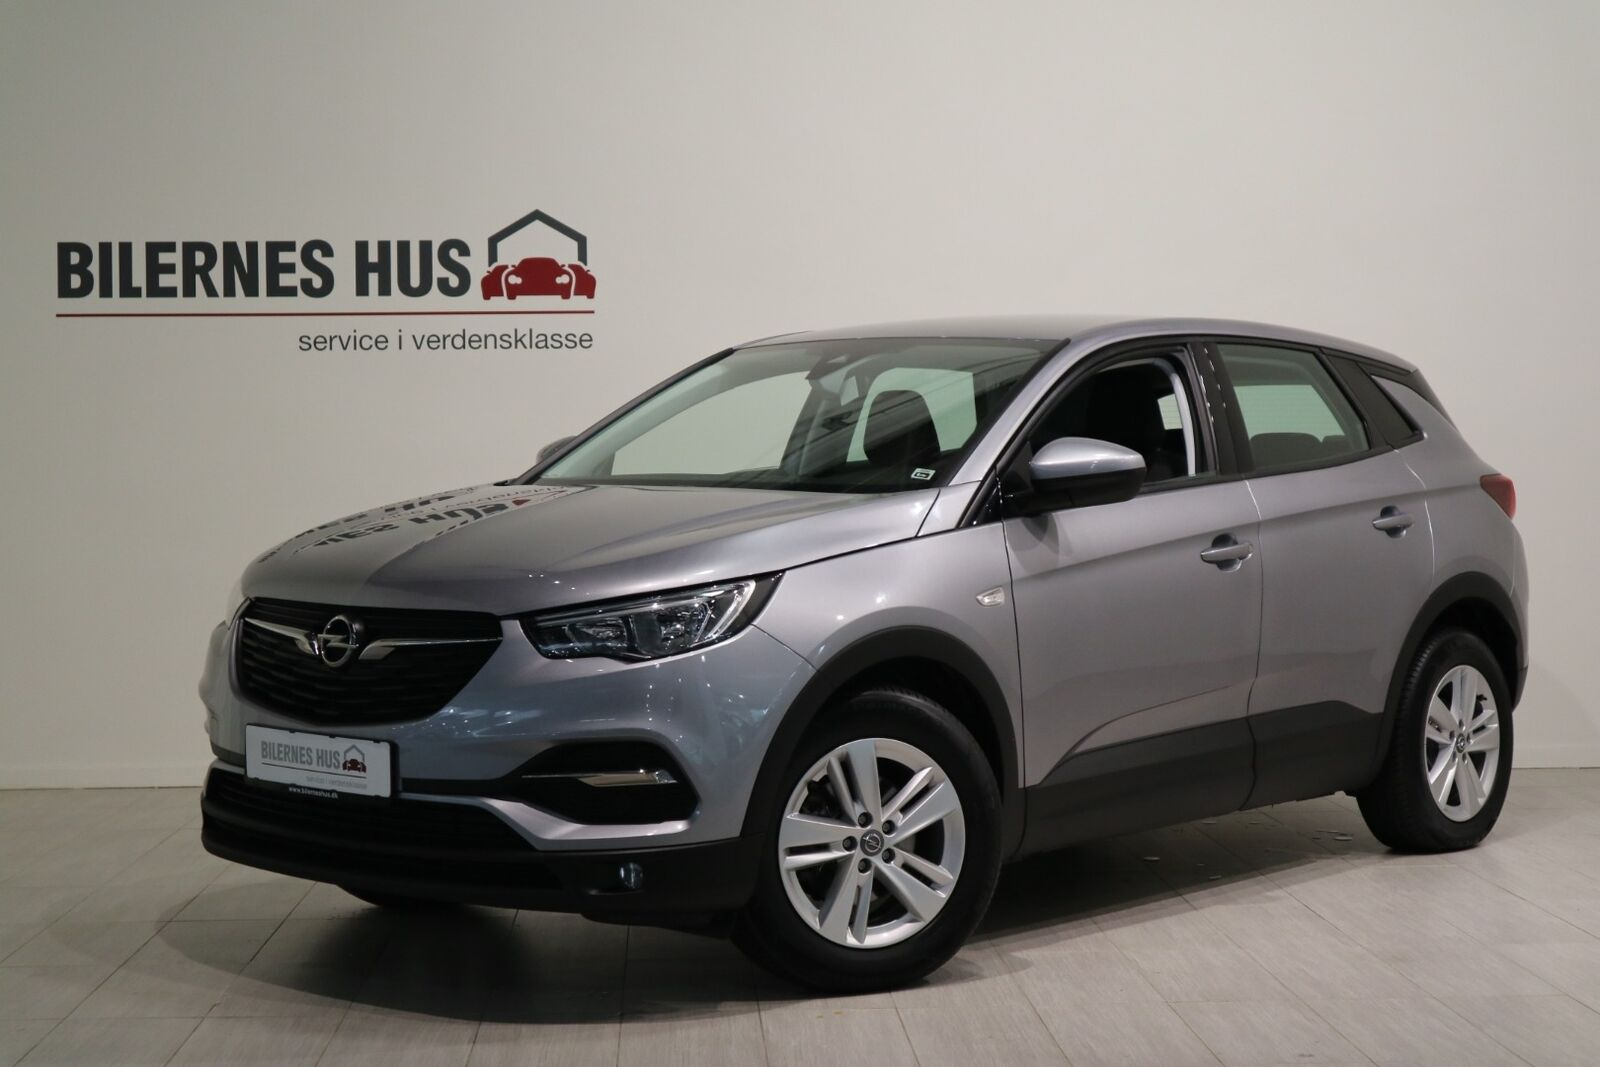 Opel Grandland X Billede 5